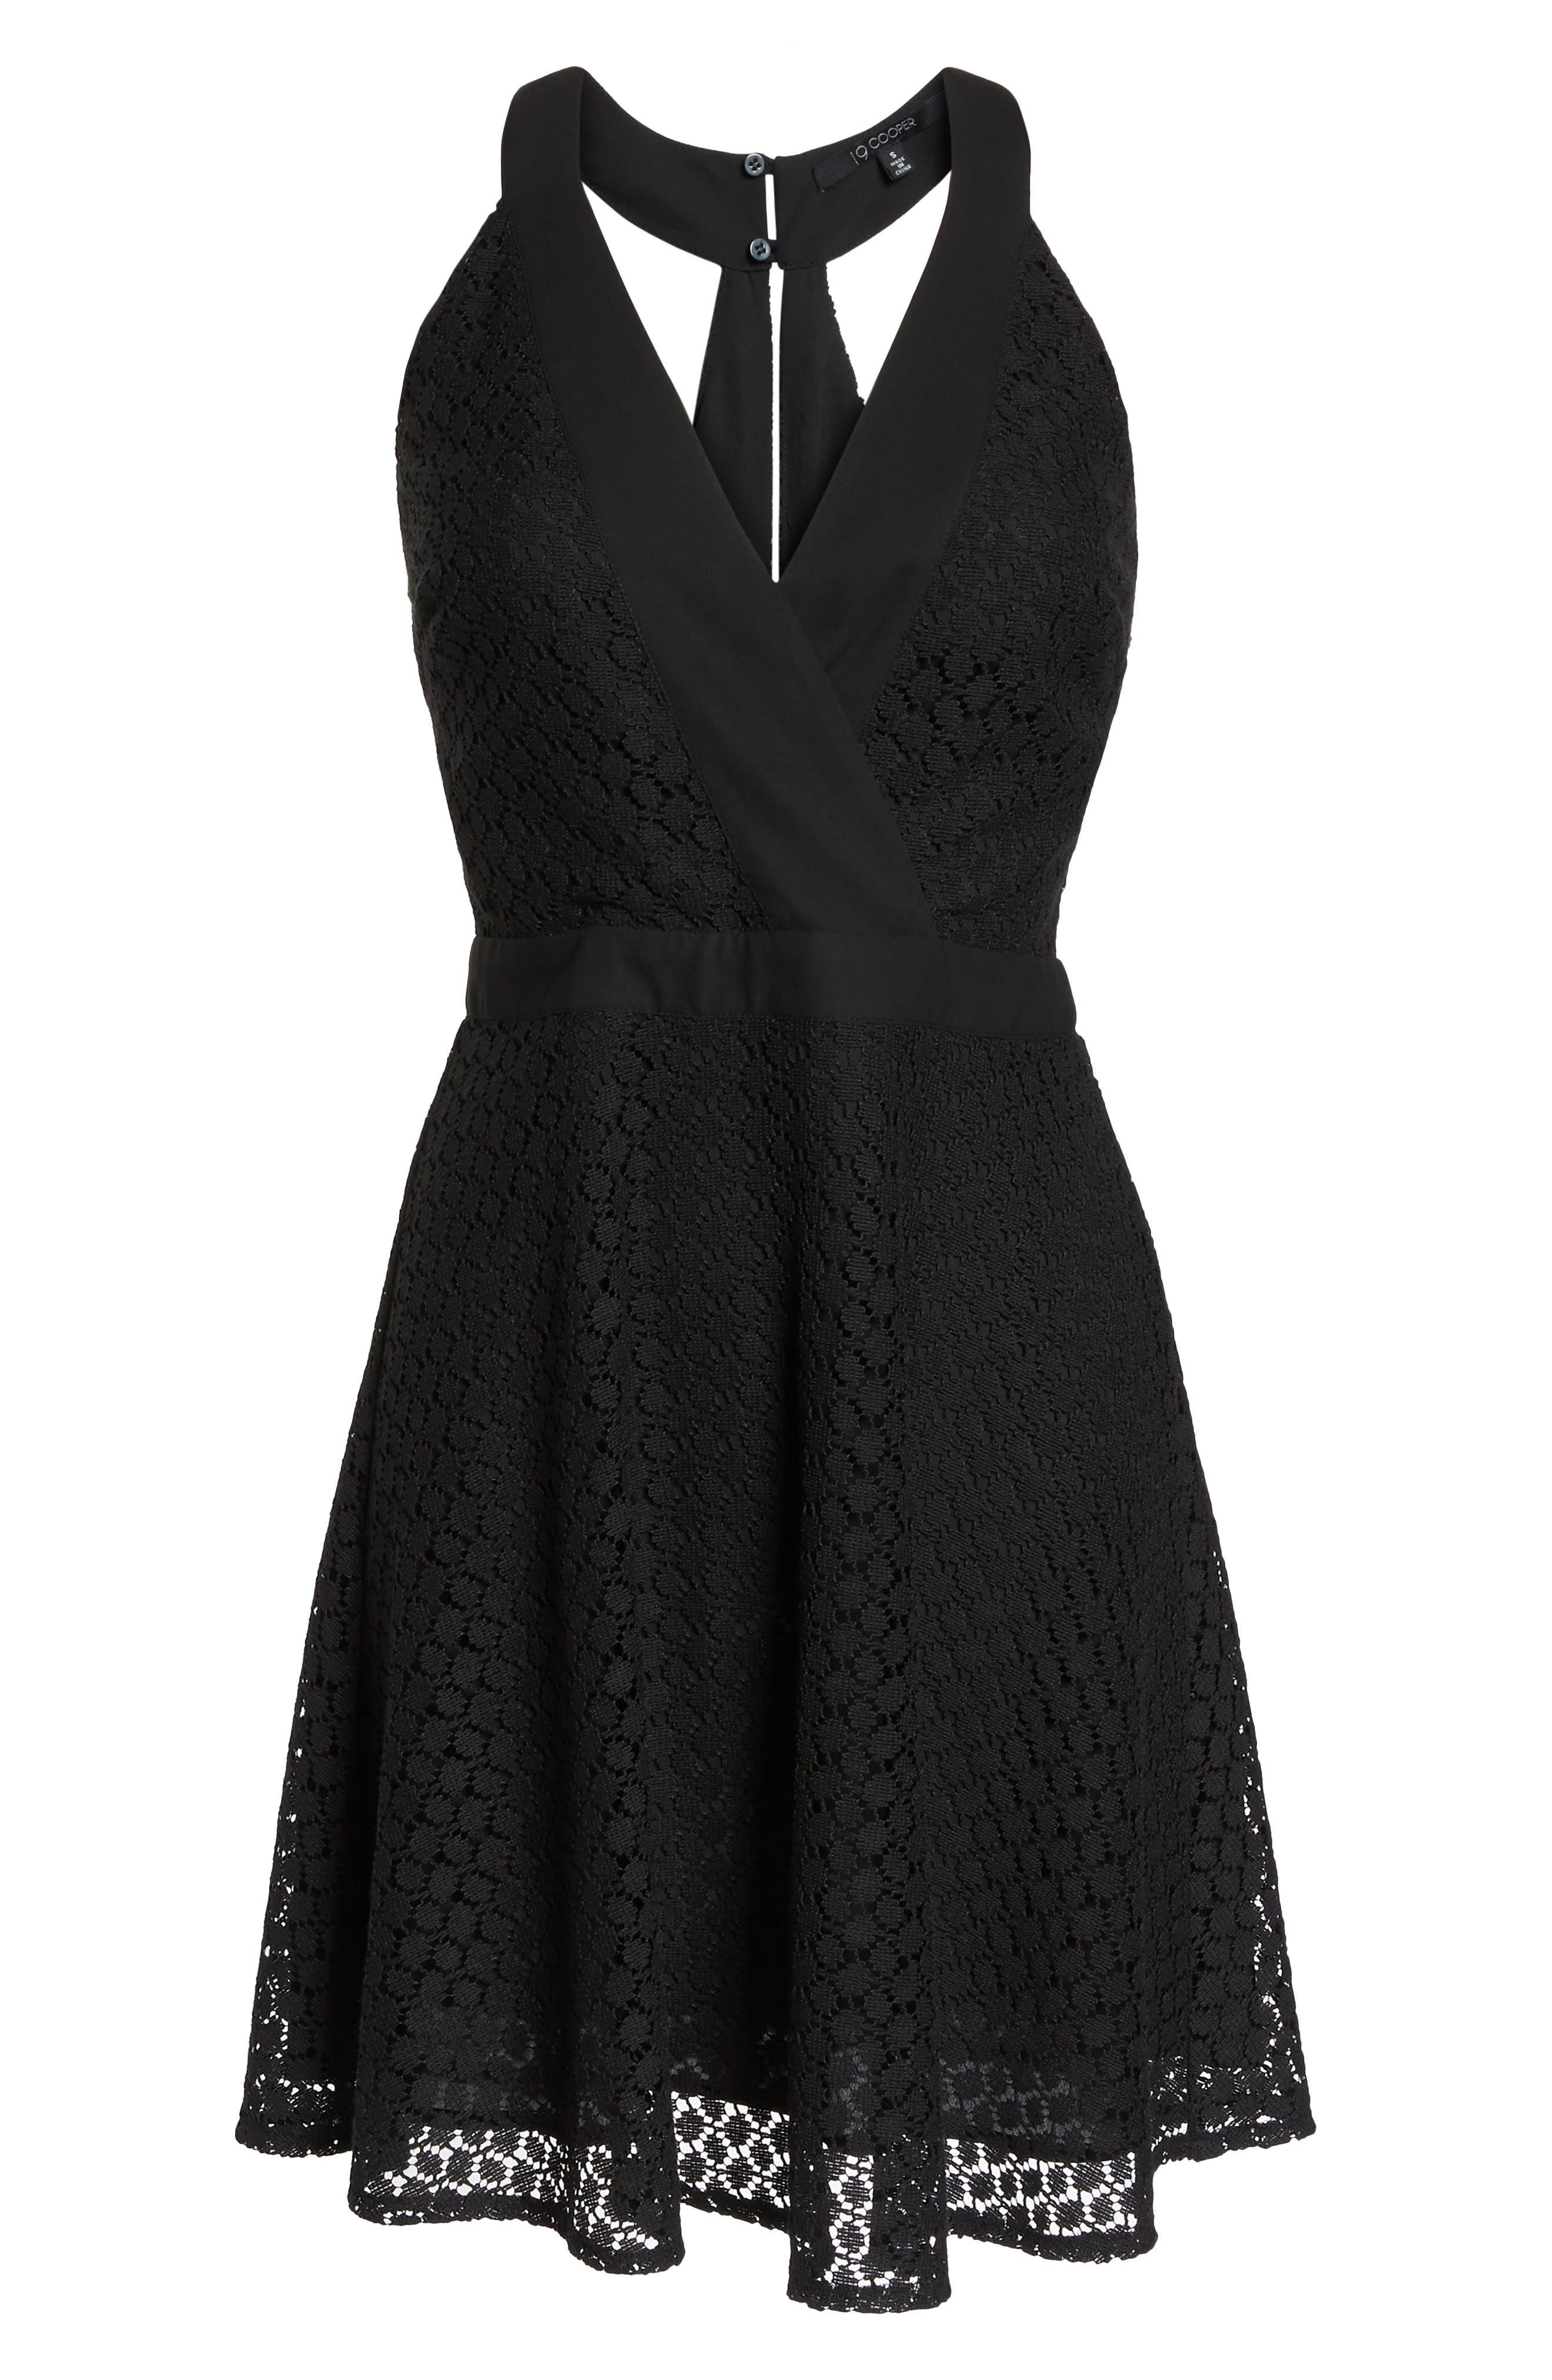 19 COOPER,                             Lace Halter Dress,                             Alternate thumbnail 7, color,                             001